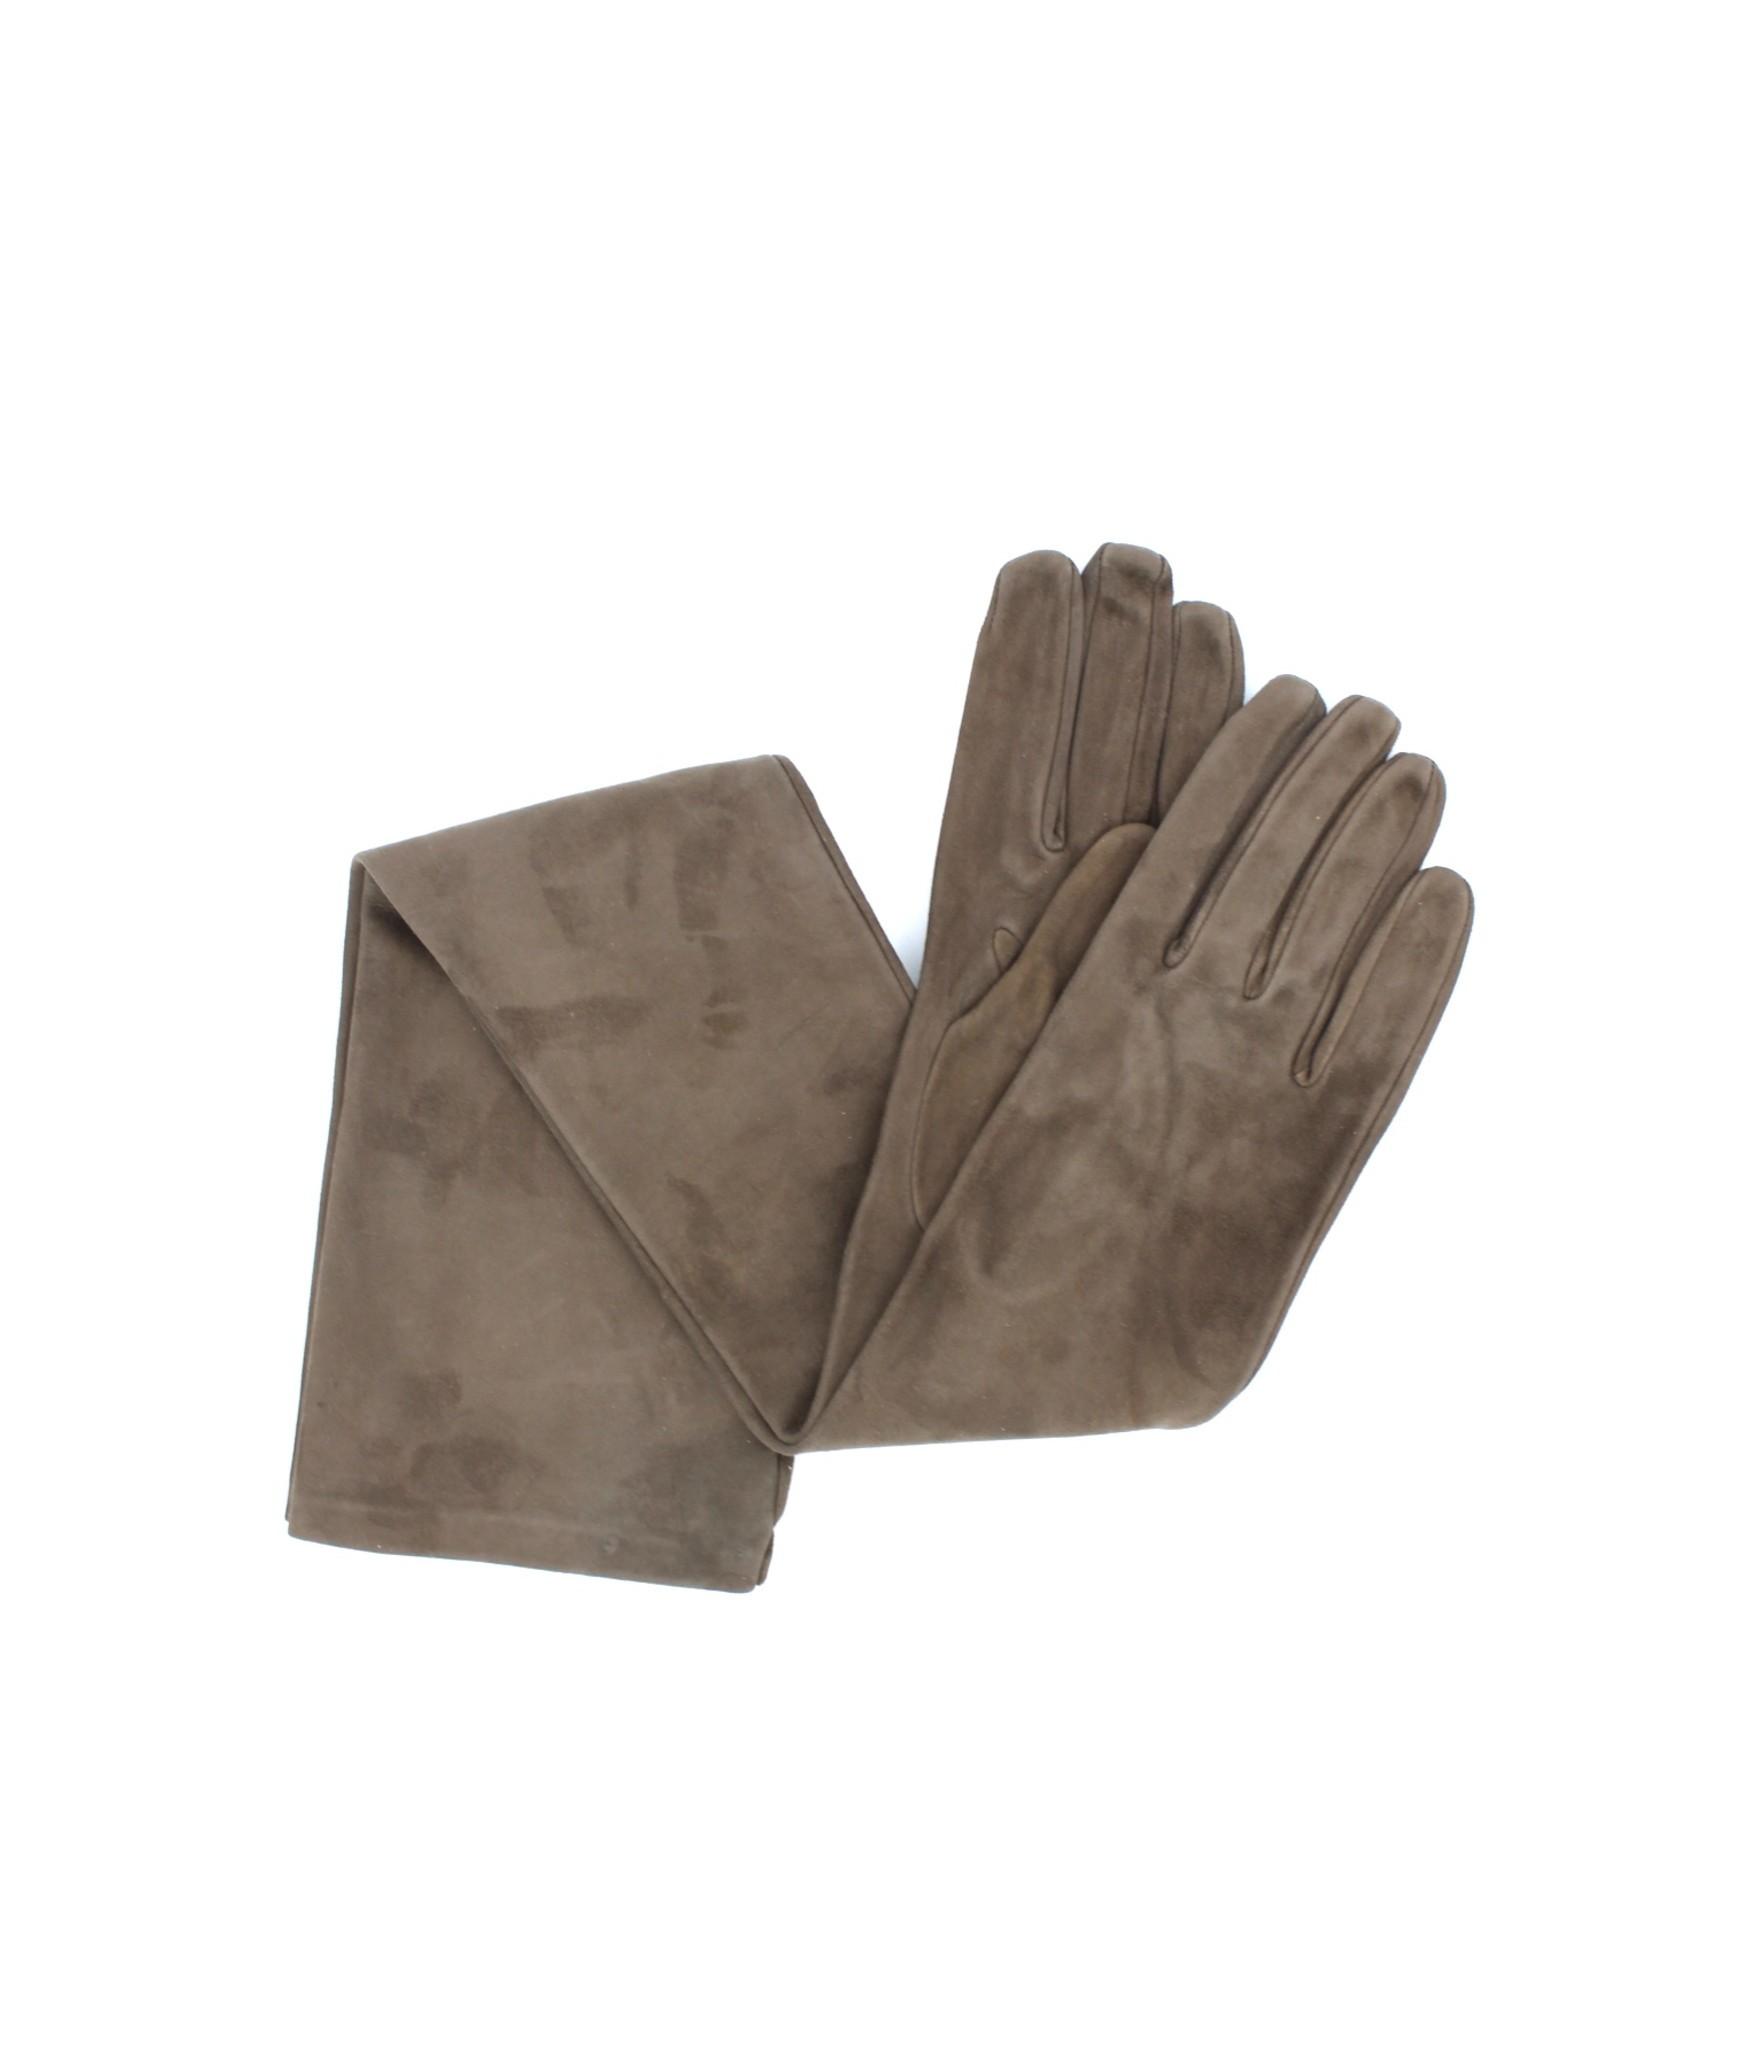 Suede Nappa leather gloves 16bt Silk lined Mud Sermoneta Gloves